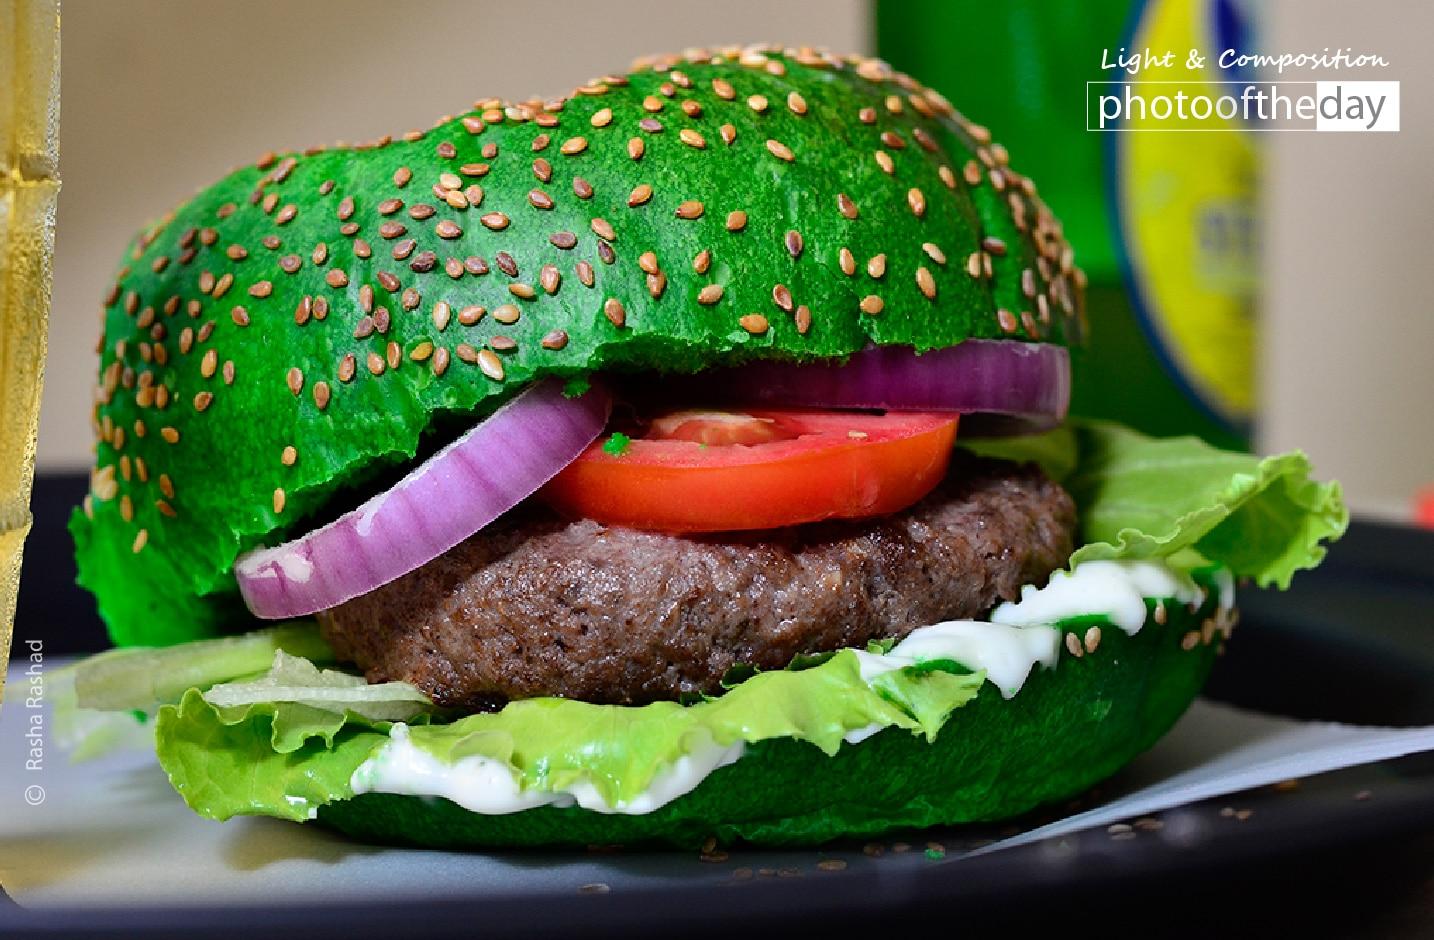 Burger in Green, by Rasha Rashad